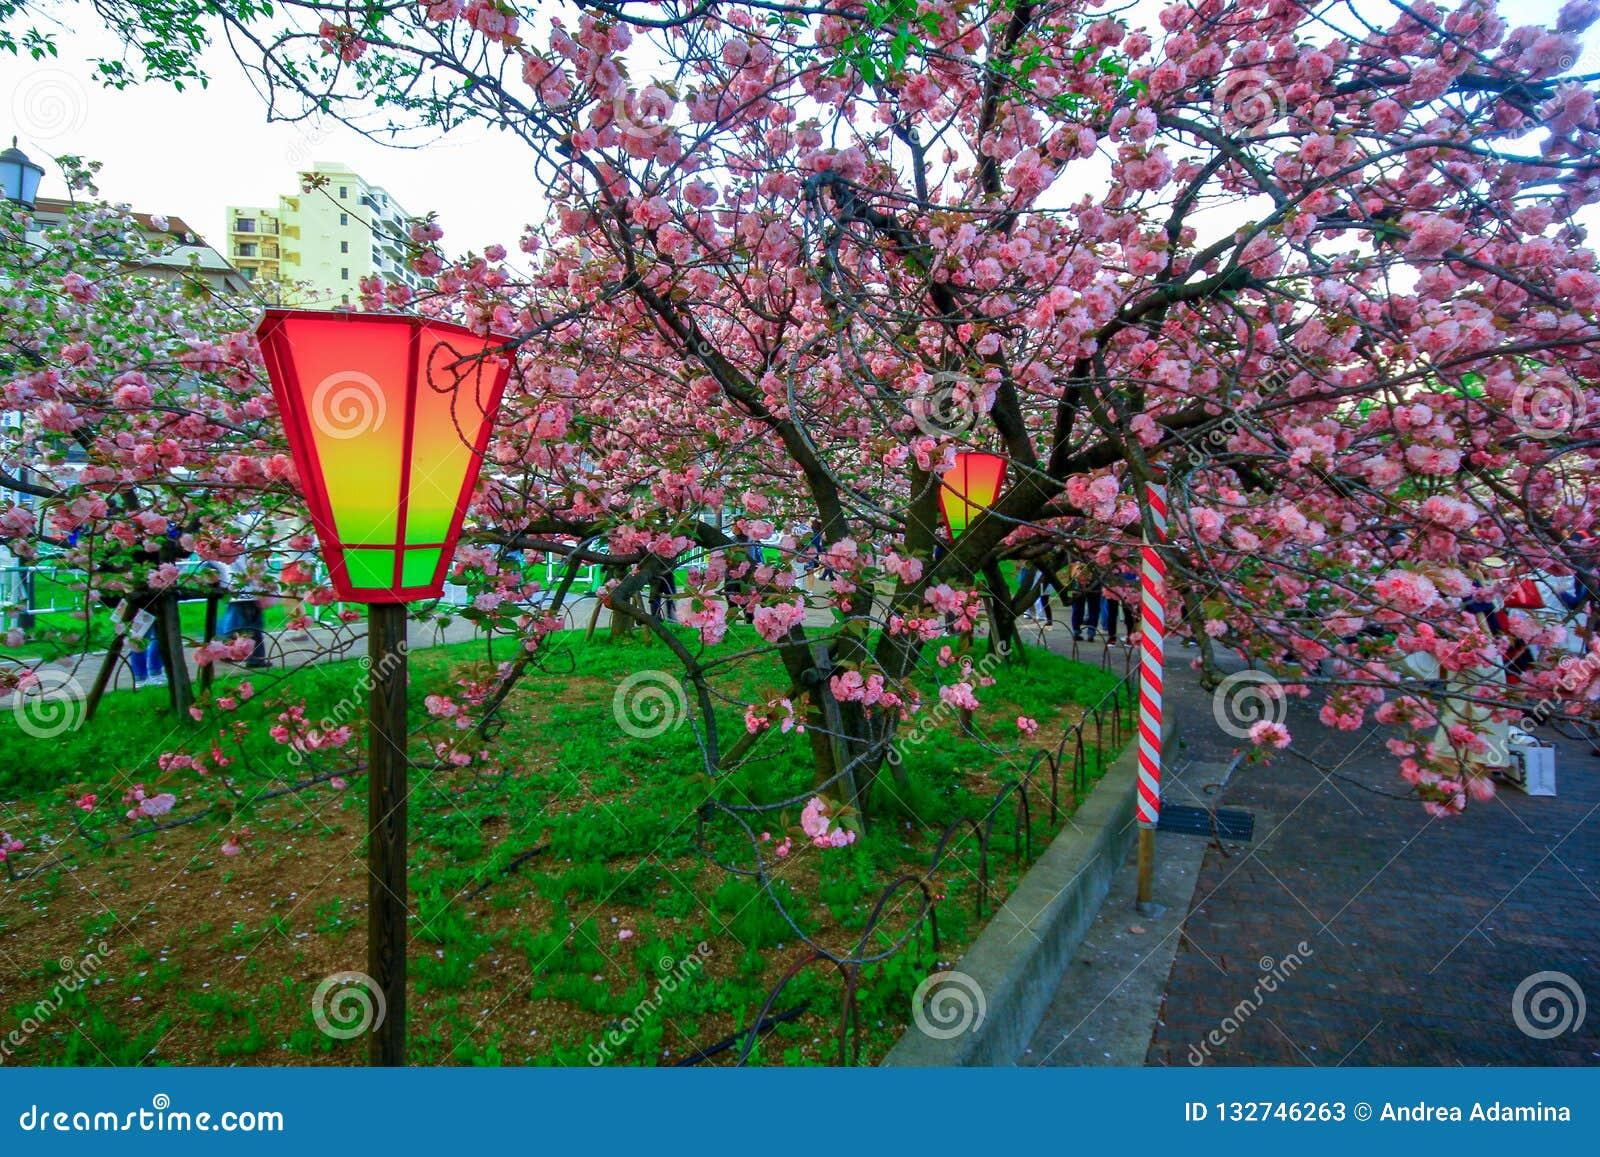 Osaka, Japan. Beautiful light and colours of Japanese lanterns and cherry blossoms